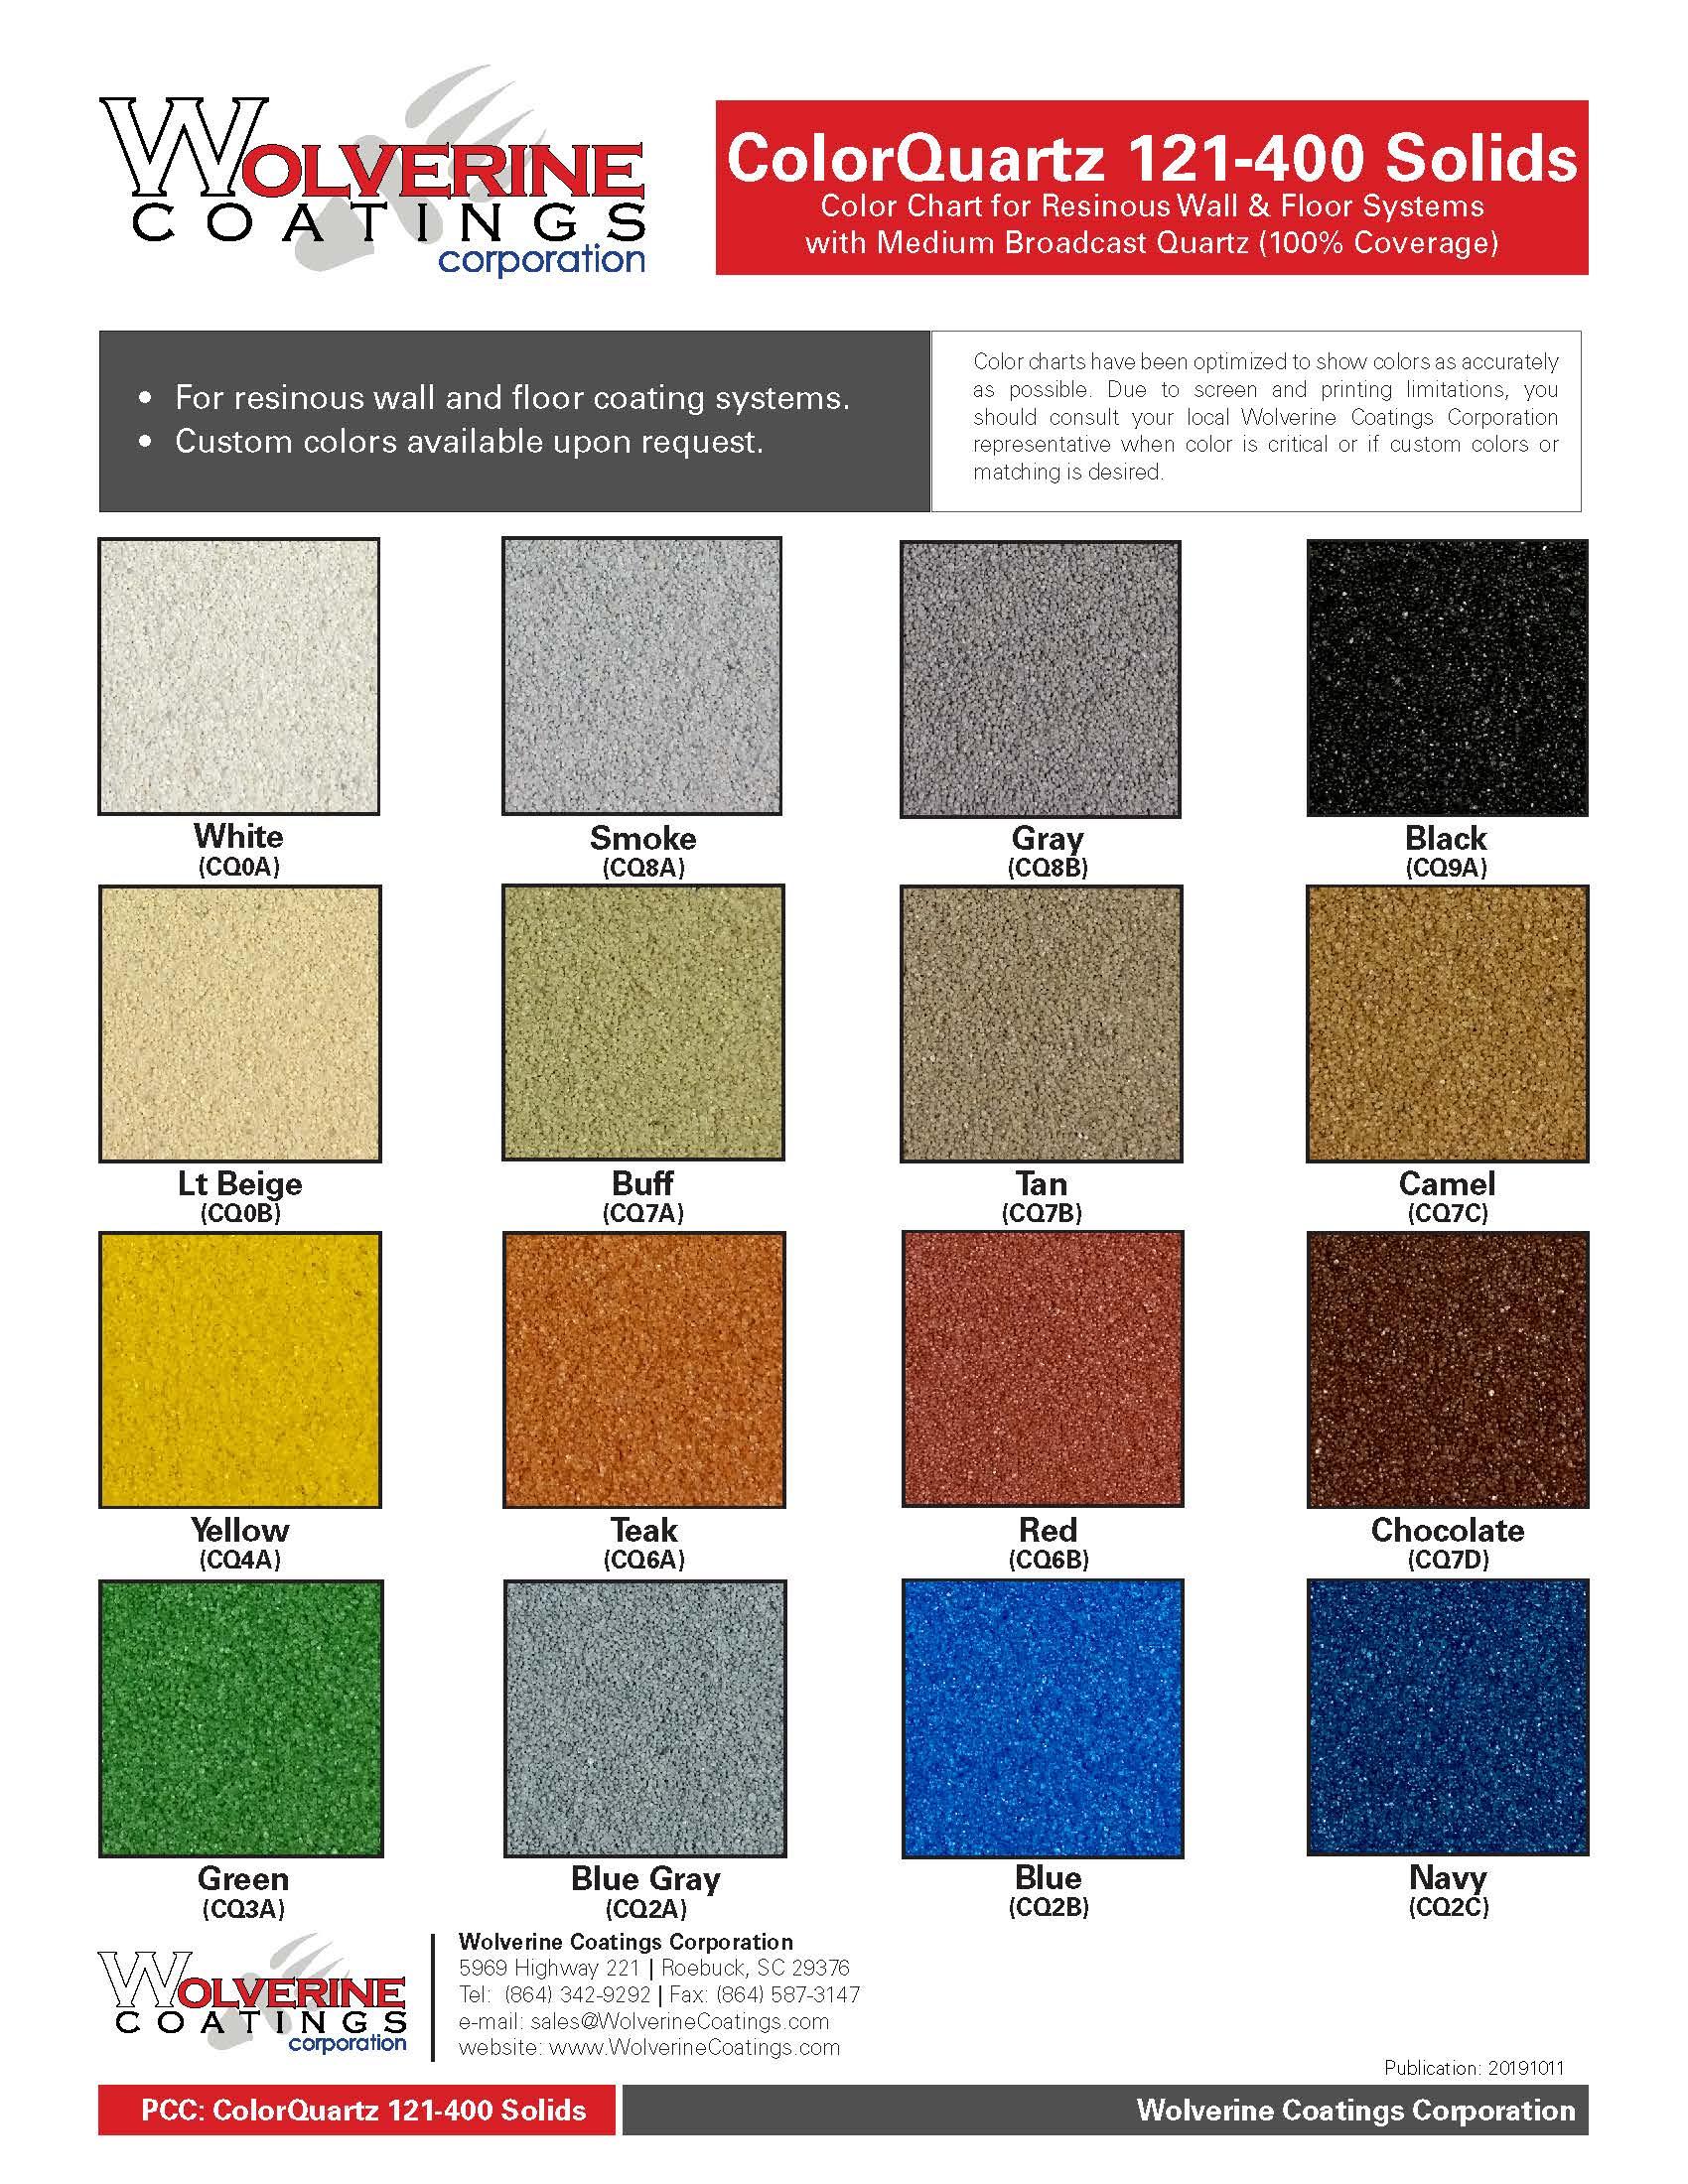 ColorQuartz 121-400 Solids Color Chart- Product Color Charts